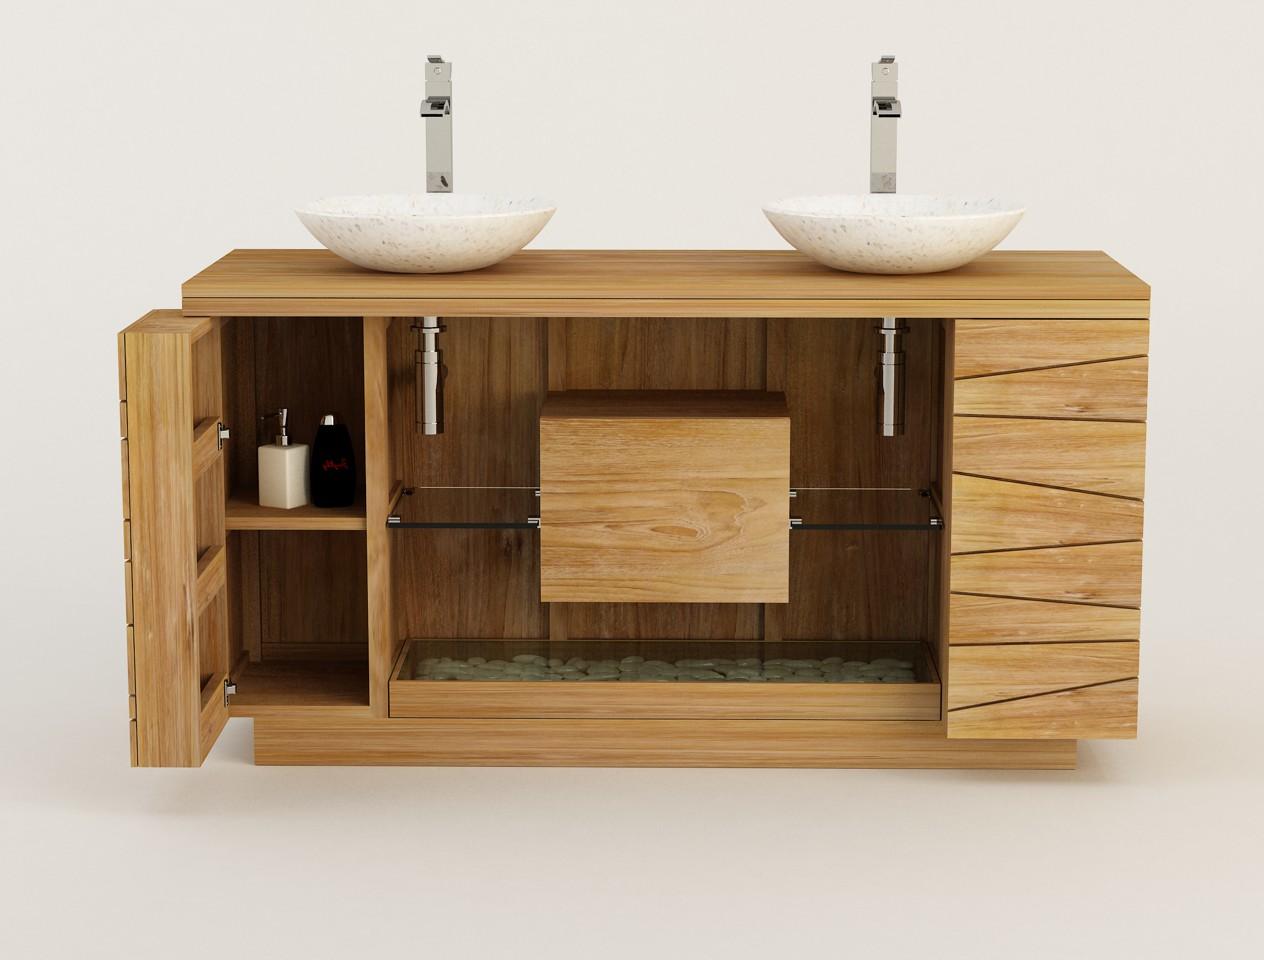 Meuble salle de bain en teck KUPU KUPU 18 cm double vasque Kayumanis